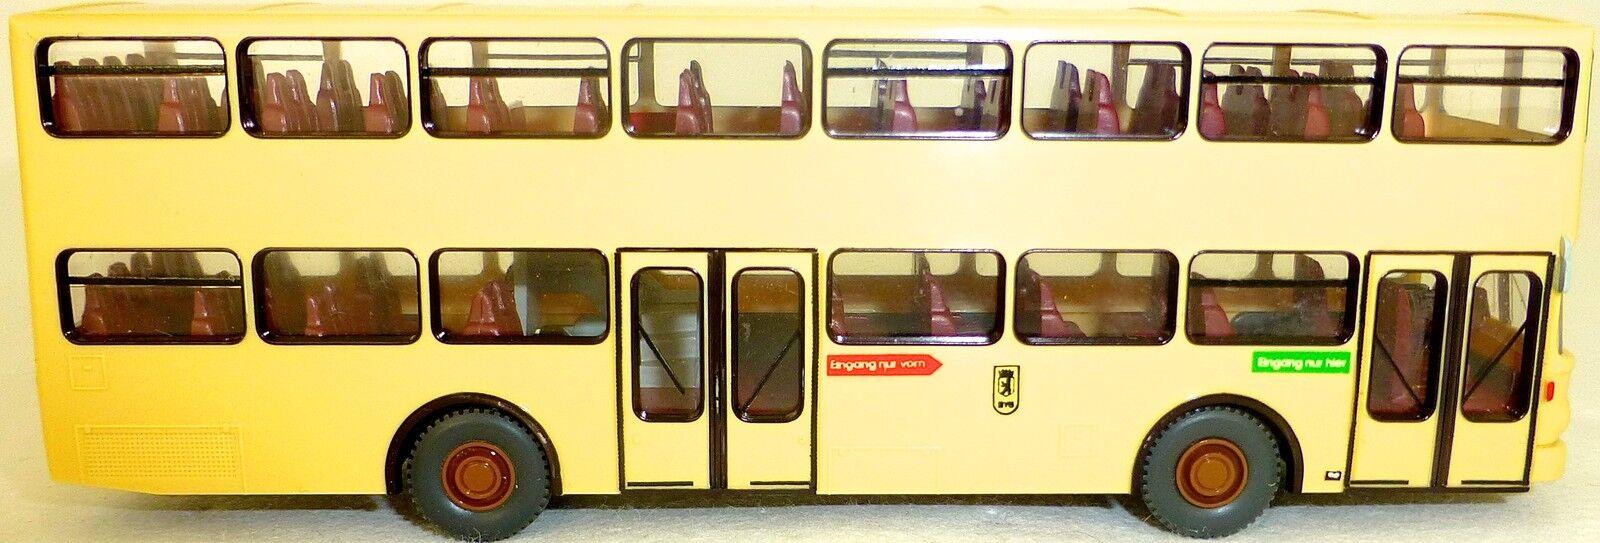 BVG biplan on sd 200 gesupert miroir rollo wiking bus 1 87 h0 schb 6 å